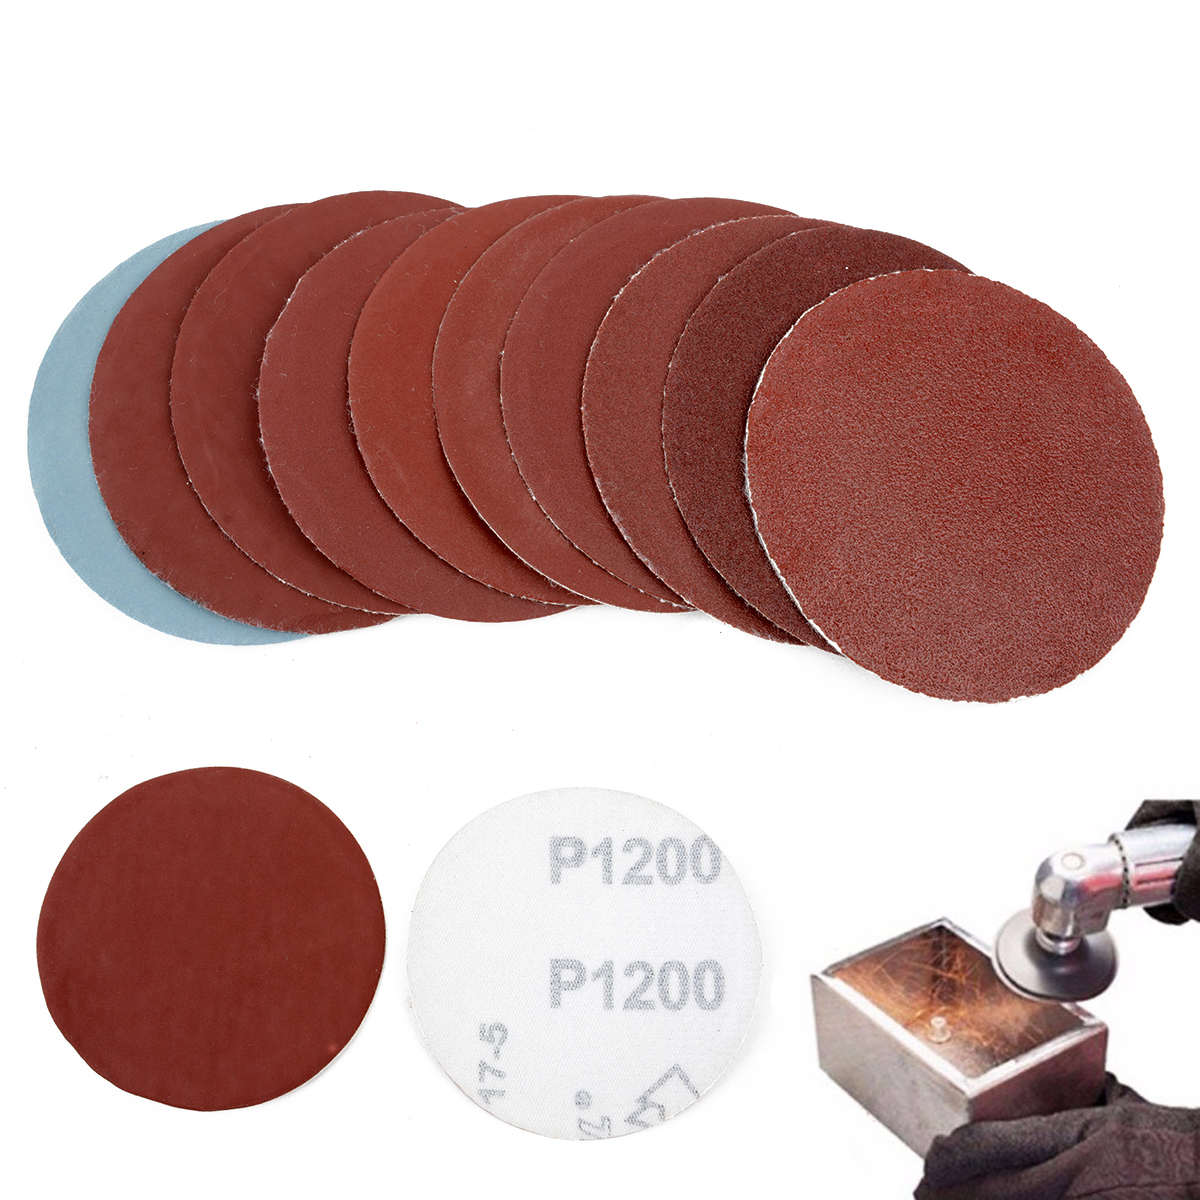 100Pcs/Set  75mm 3'' Round Sandpaper Disc Sand Sheet Sanding Discs Grinding Pads For Sander Grits With Grit 80-3000